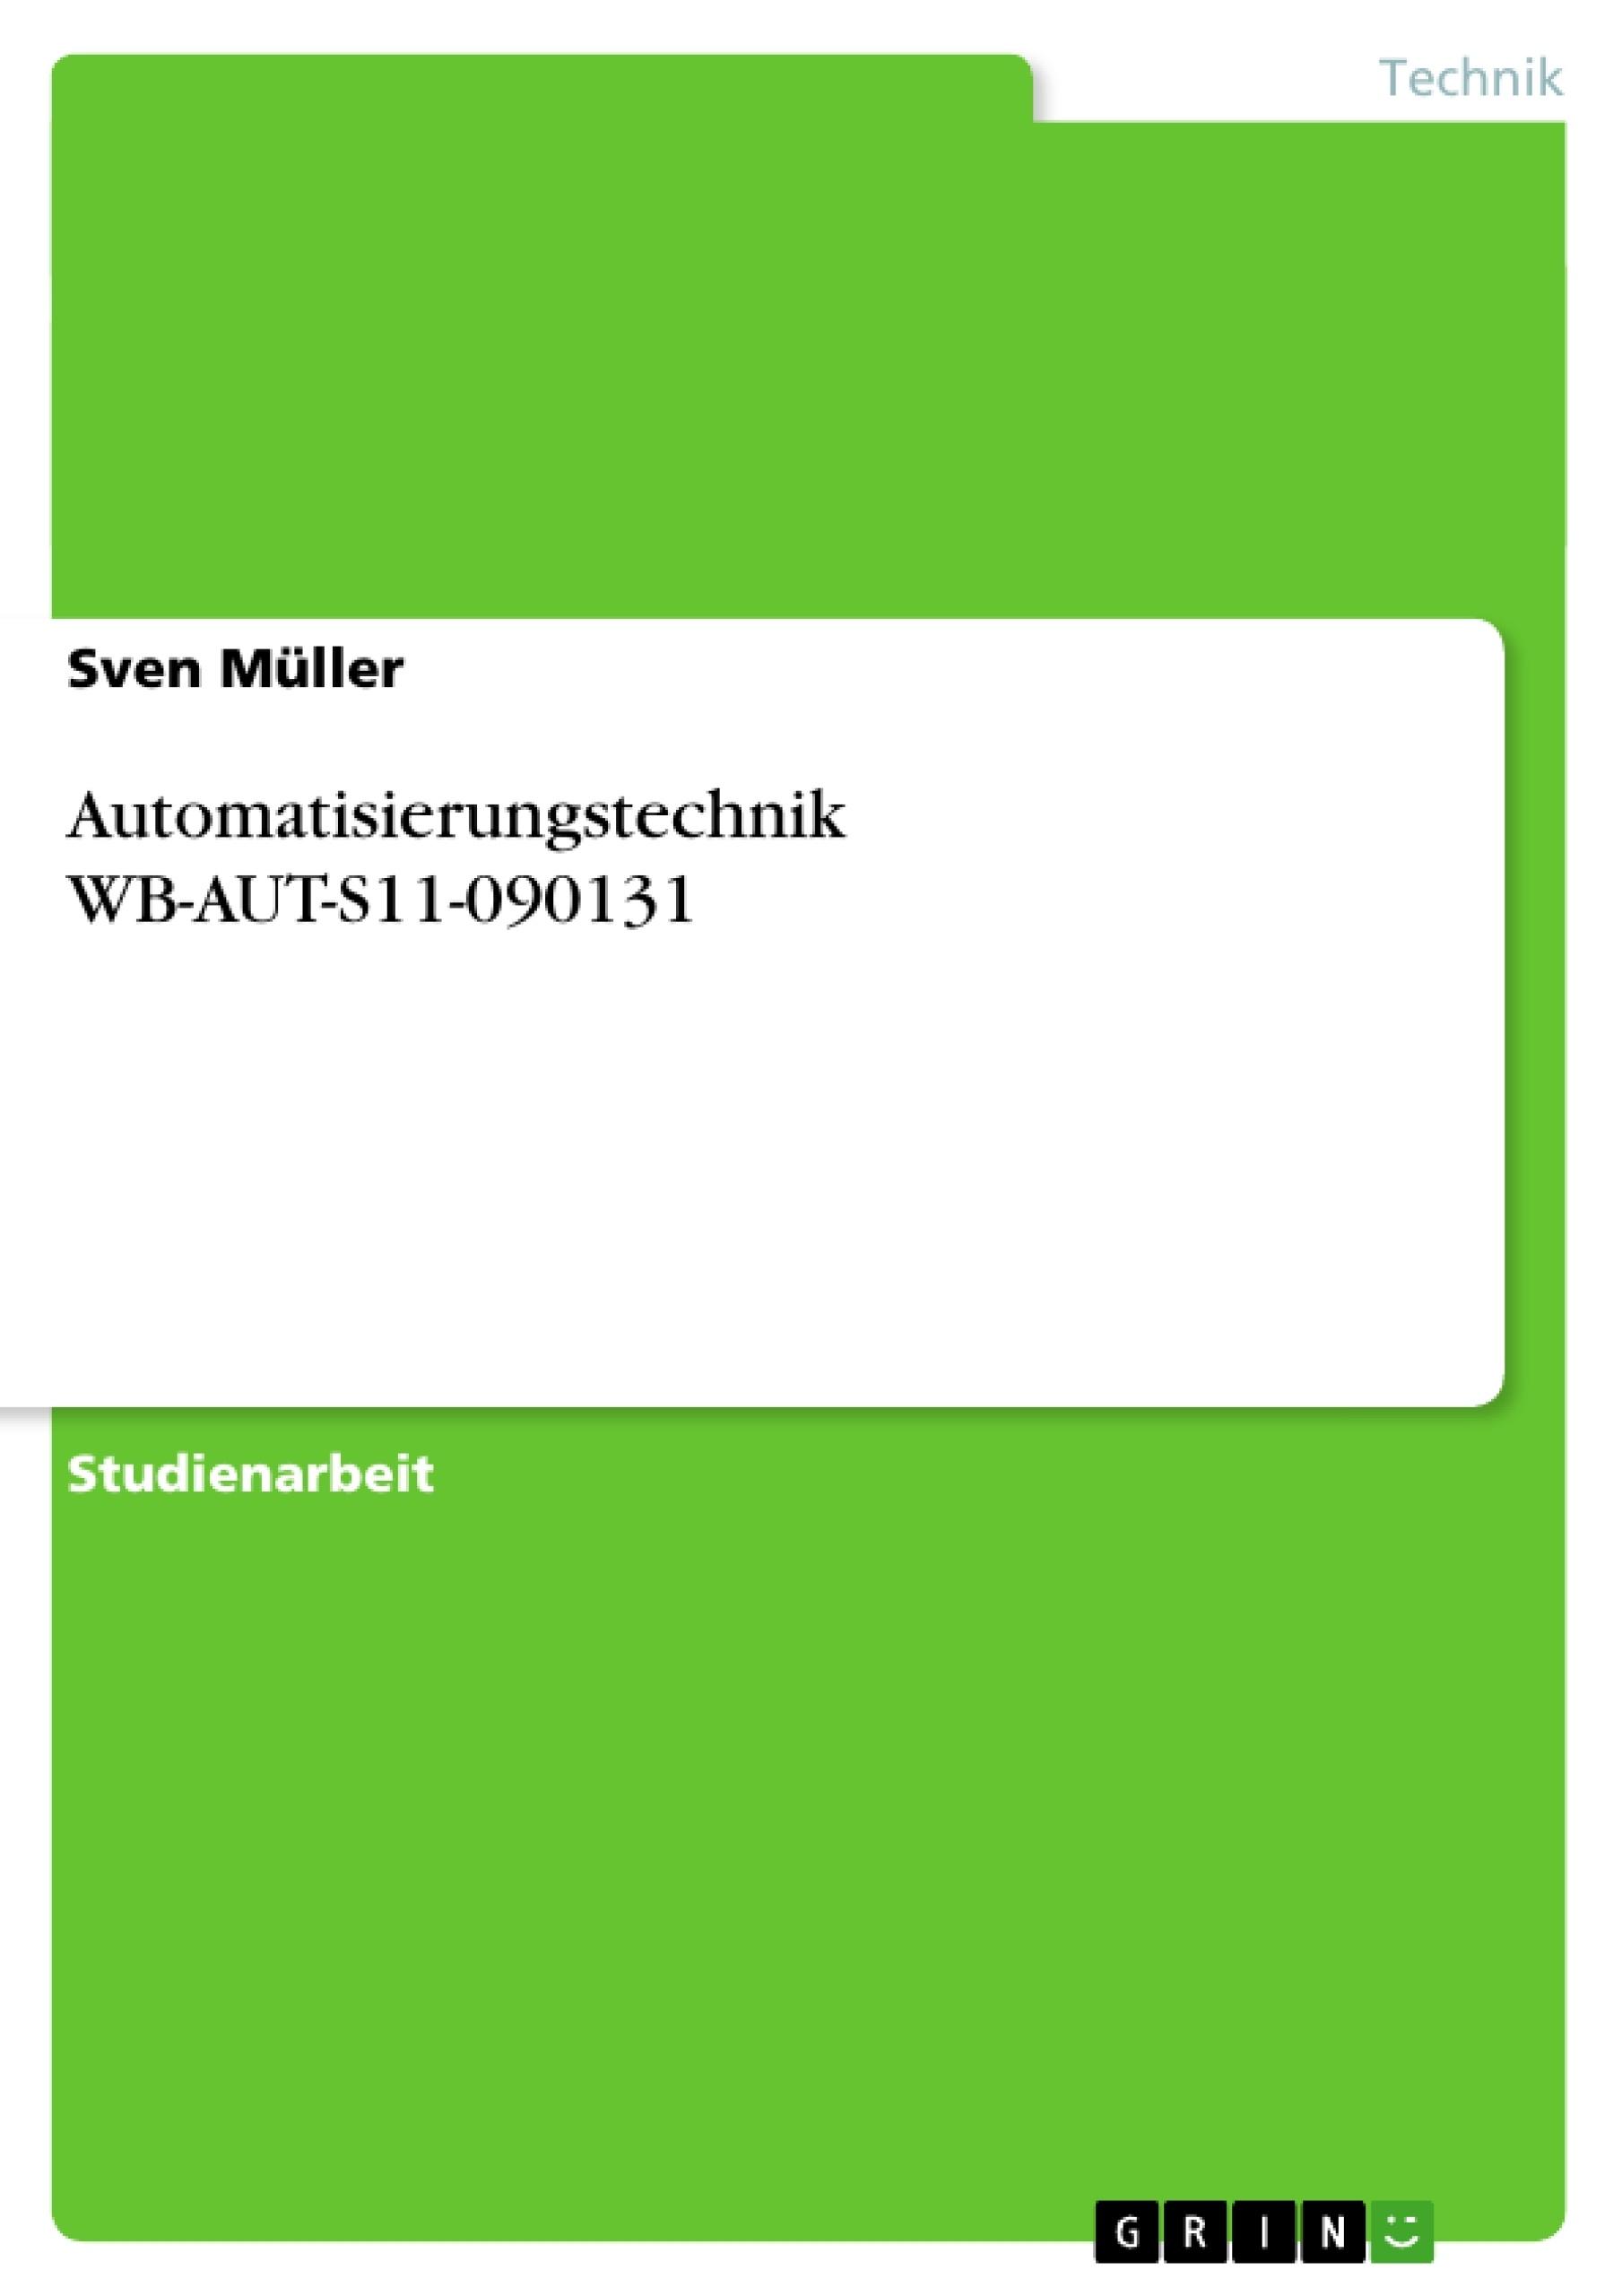 Titel: Automatisierungstechnik WB-AUT-S11-090131